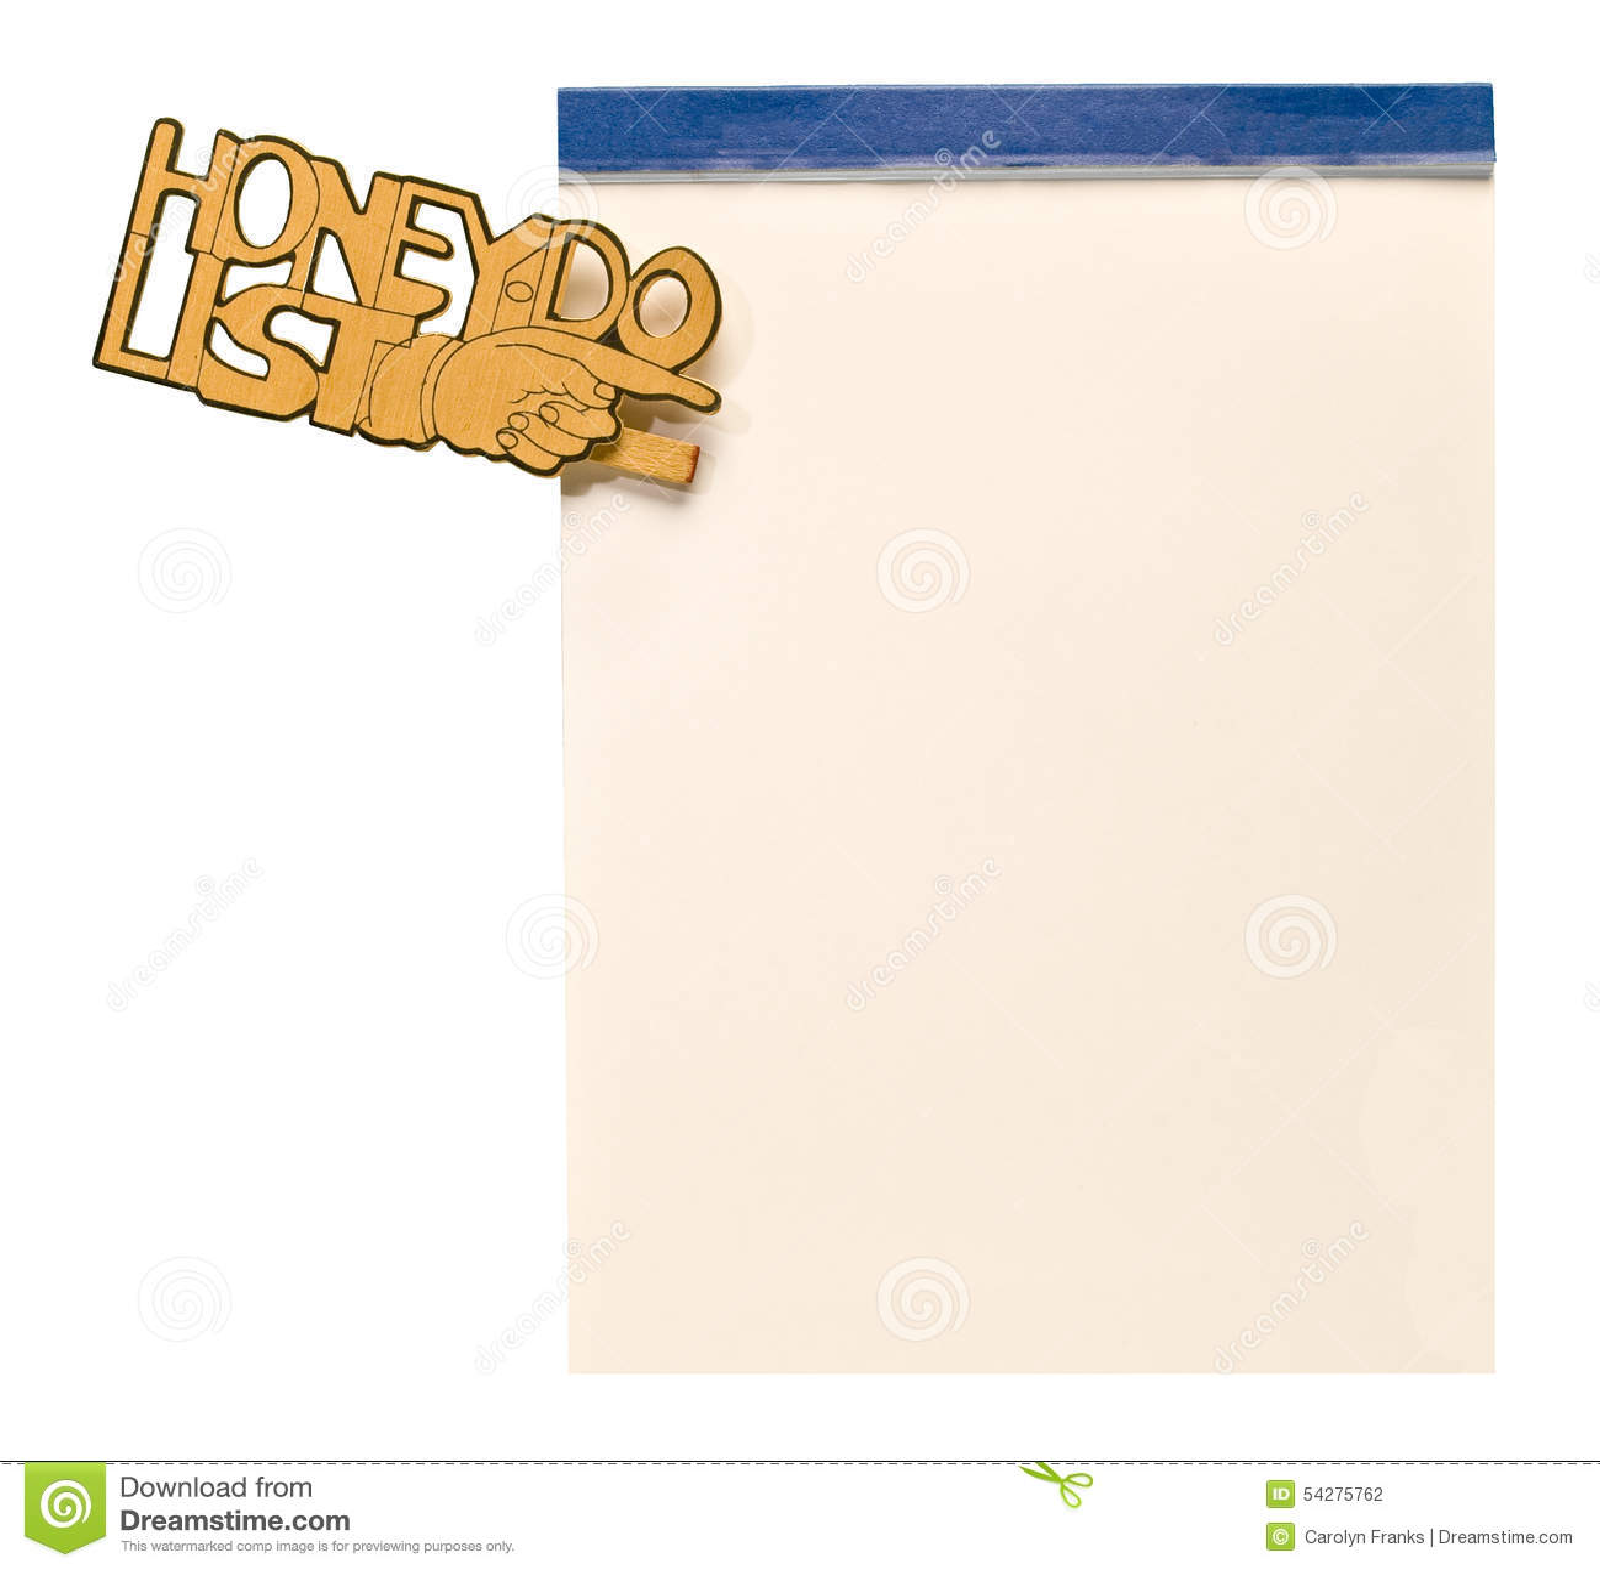 graphic regarding Honey Do List Printable called Honey Do Listing inventory photograph. Graphic of rectangle, isolated